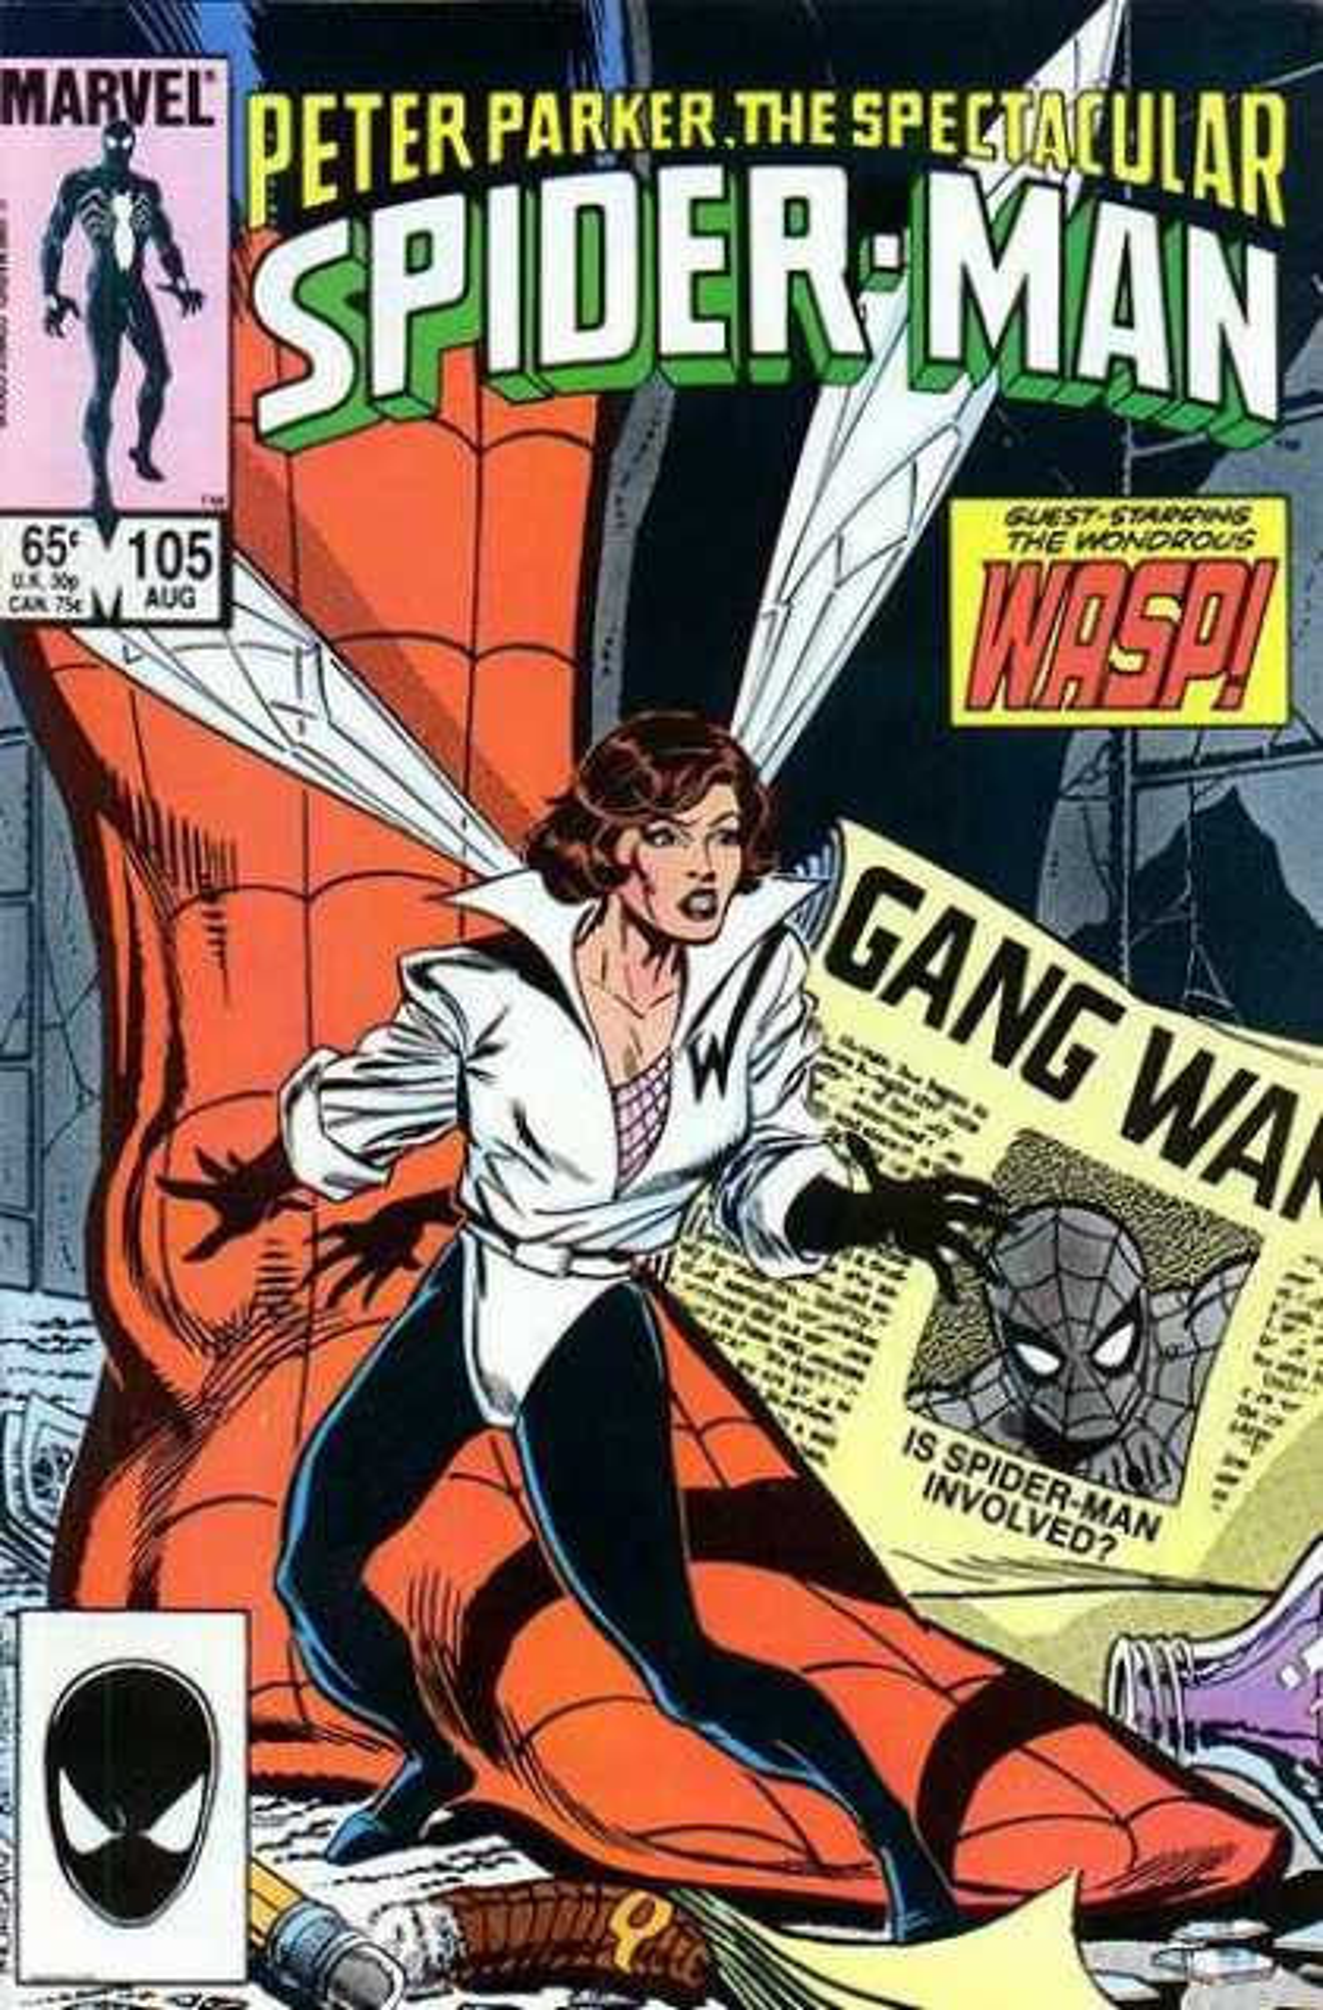 Peter Parker, The Spectacular Spider-Man Vol 1 105